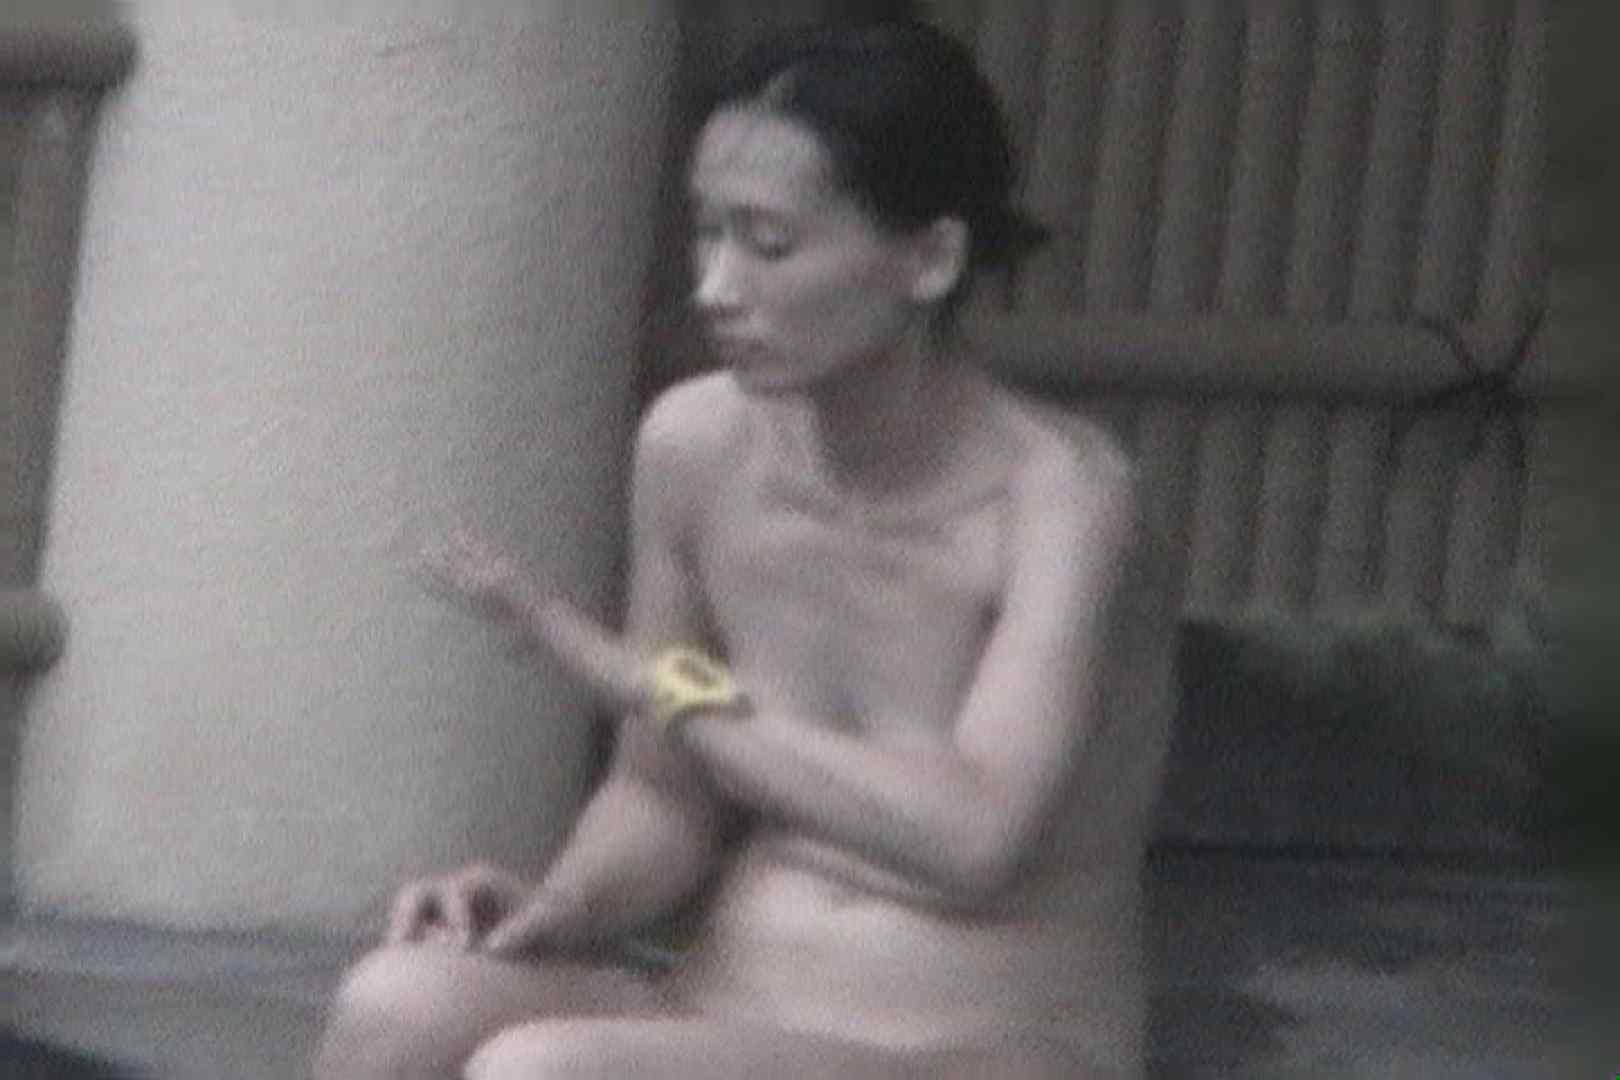 Aquaな露天風呂Vol.557 盗撮映像  23Pix 15